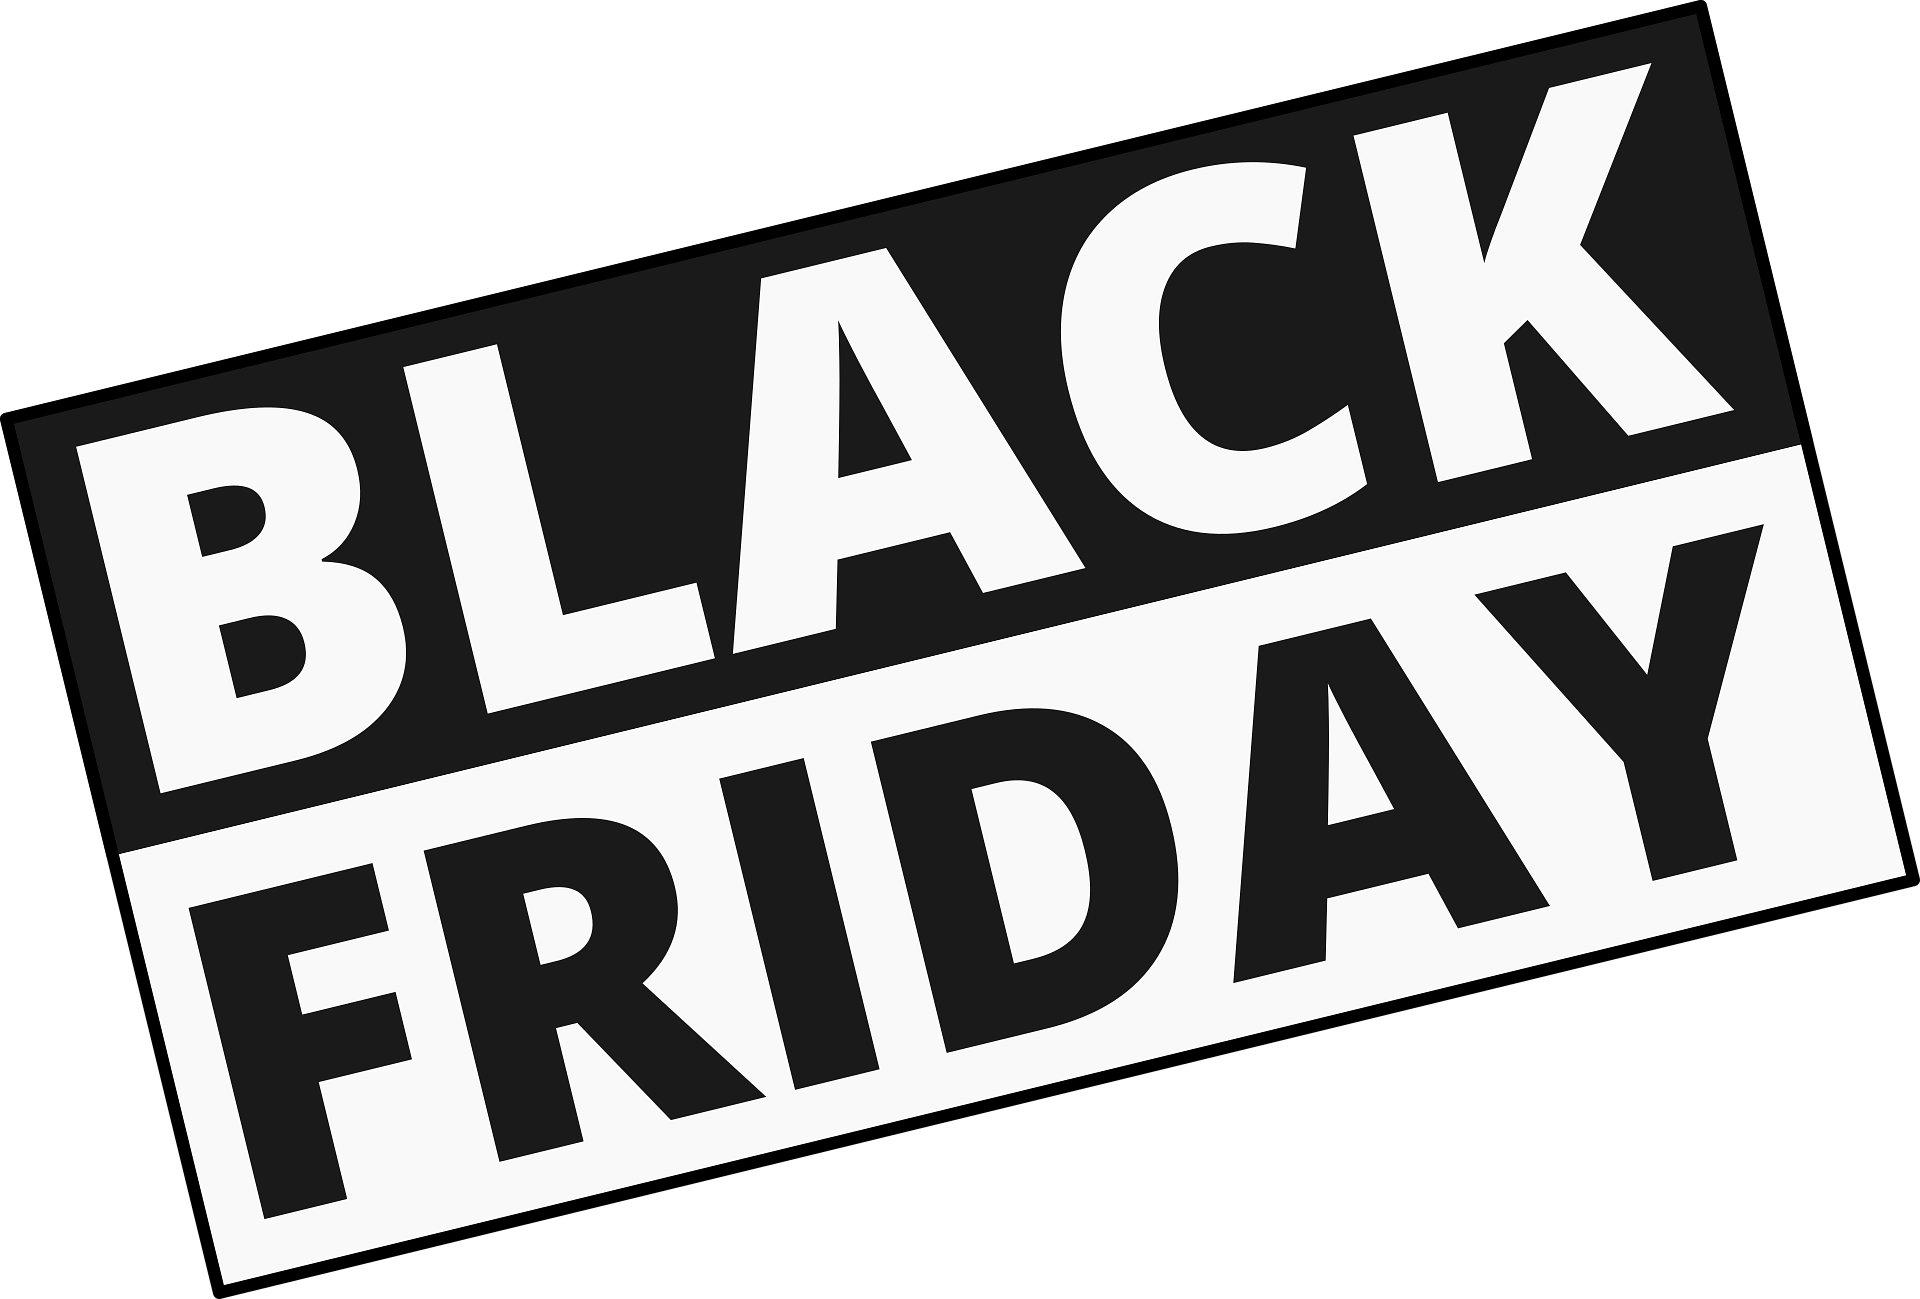 The Newest Black Friday Deals for Top Beauty Brands: Estee Lauder, Lancome, Origins, Shiseido